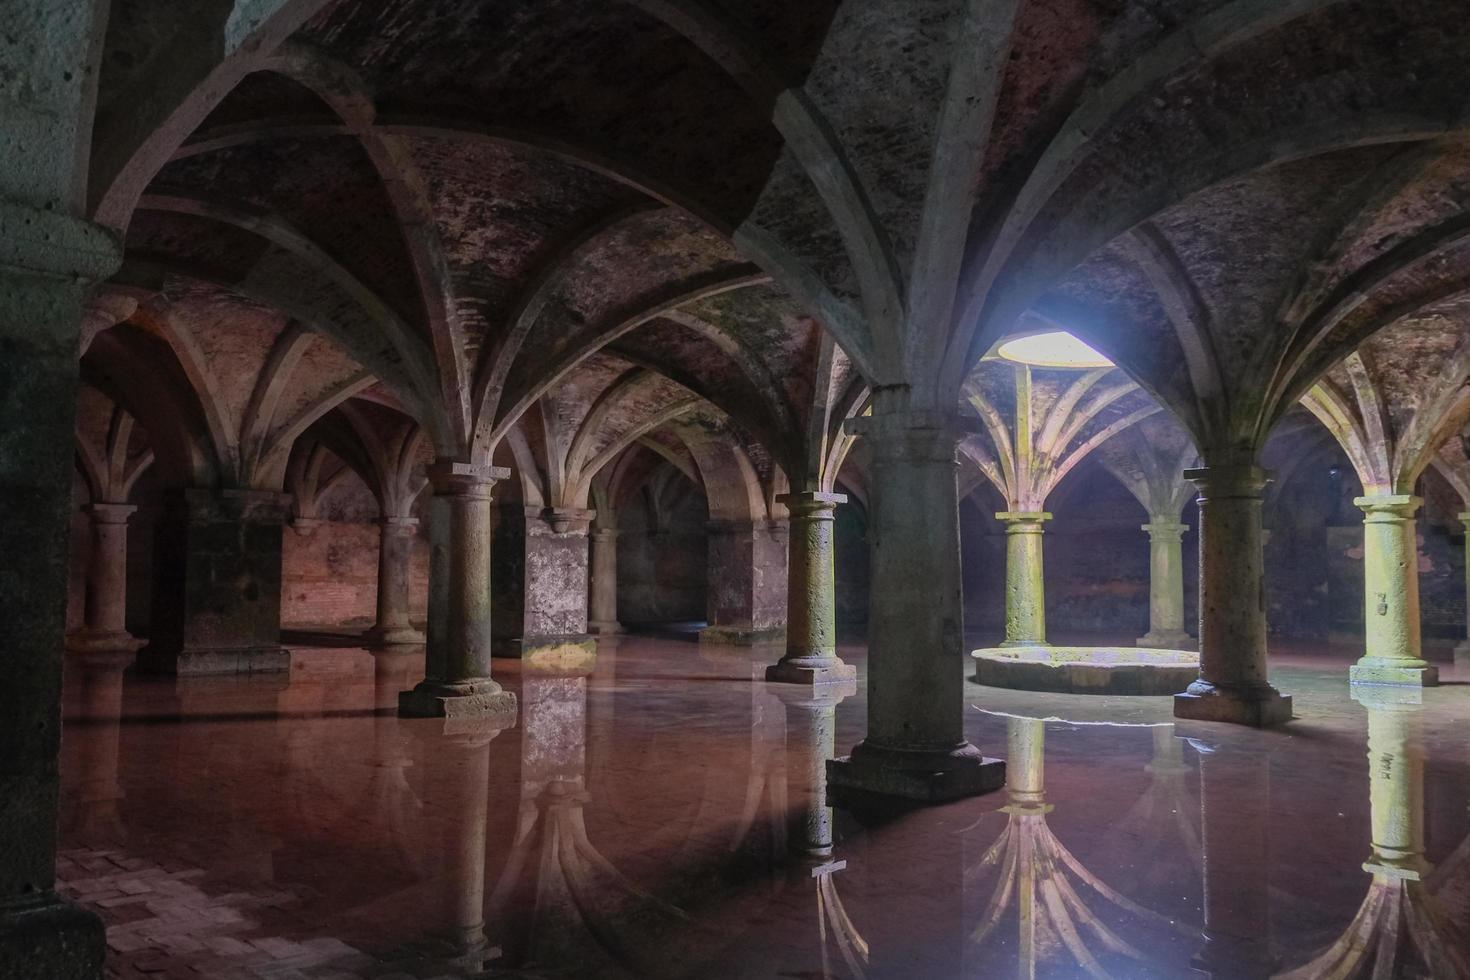 Ancient Portuguese underground cistern photo